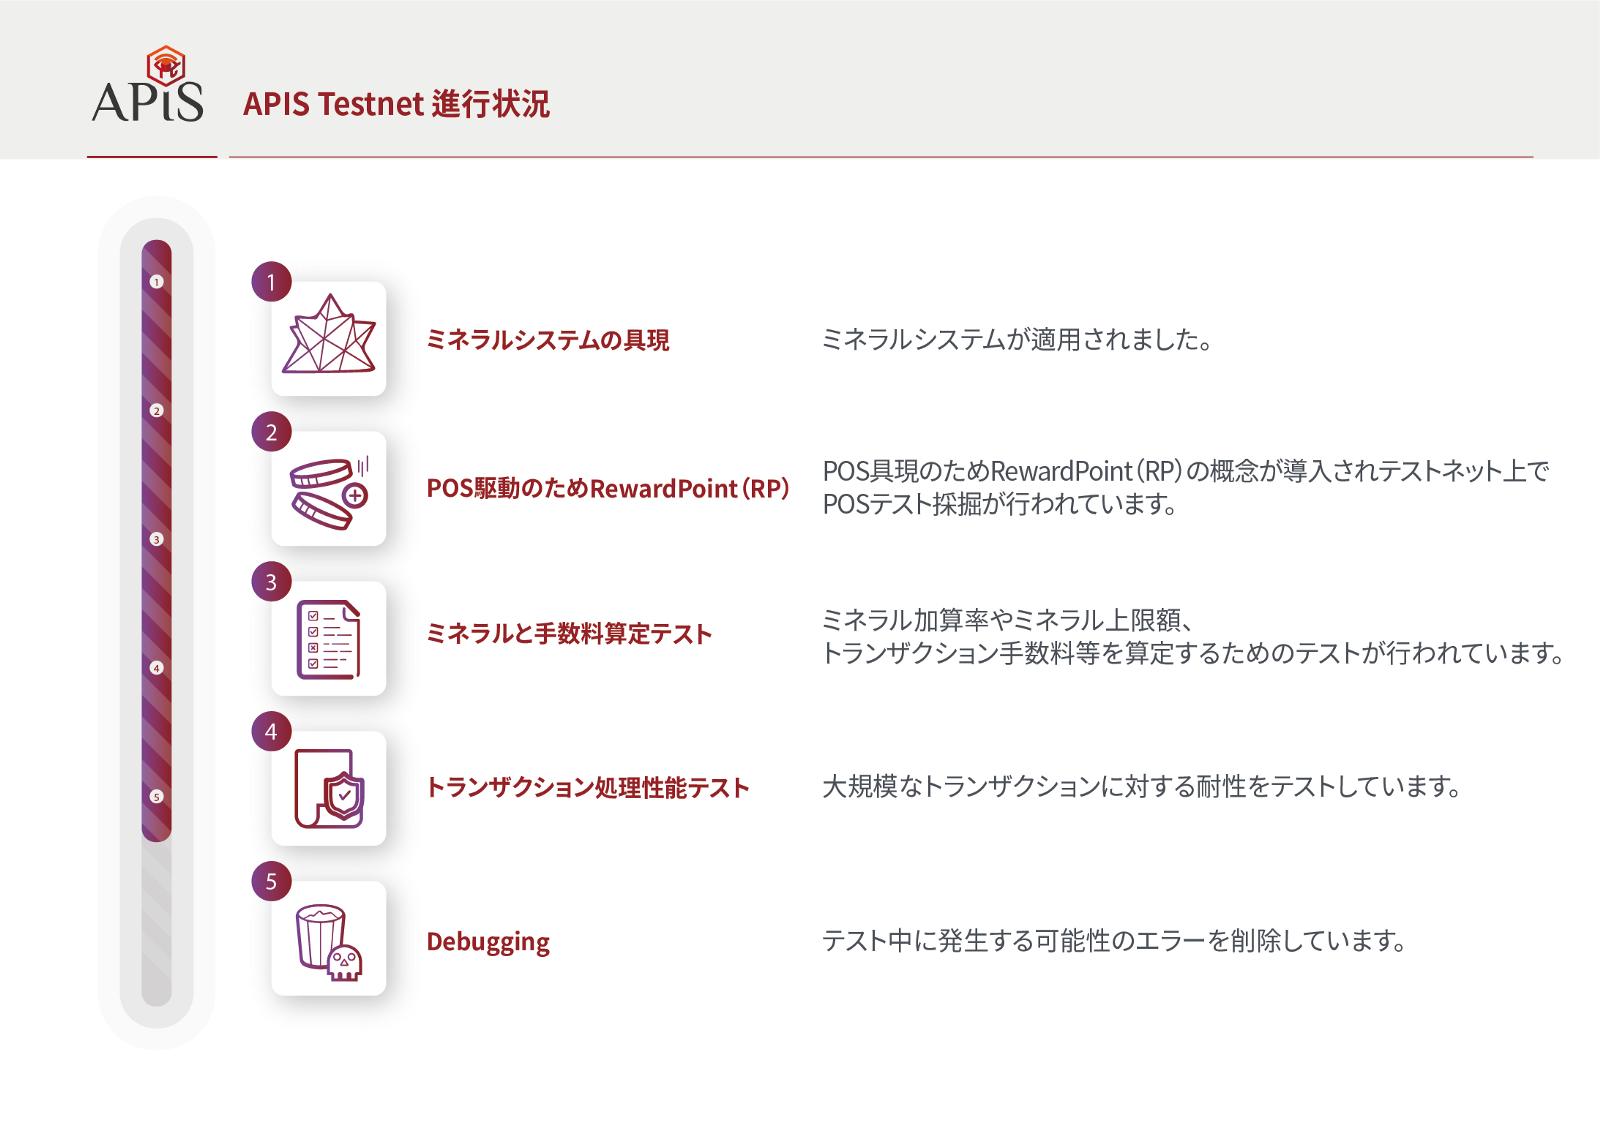 APIS(エイピス) Testnet(テストネット)